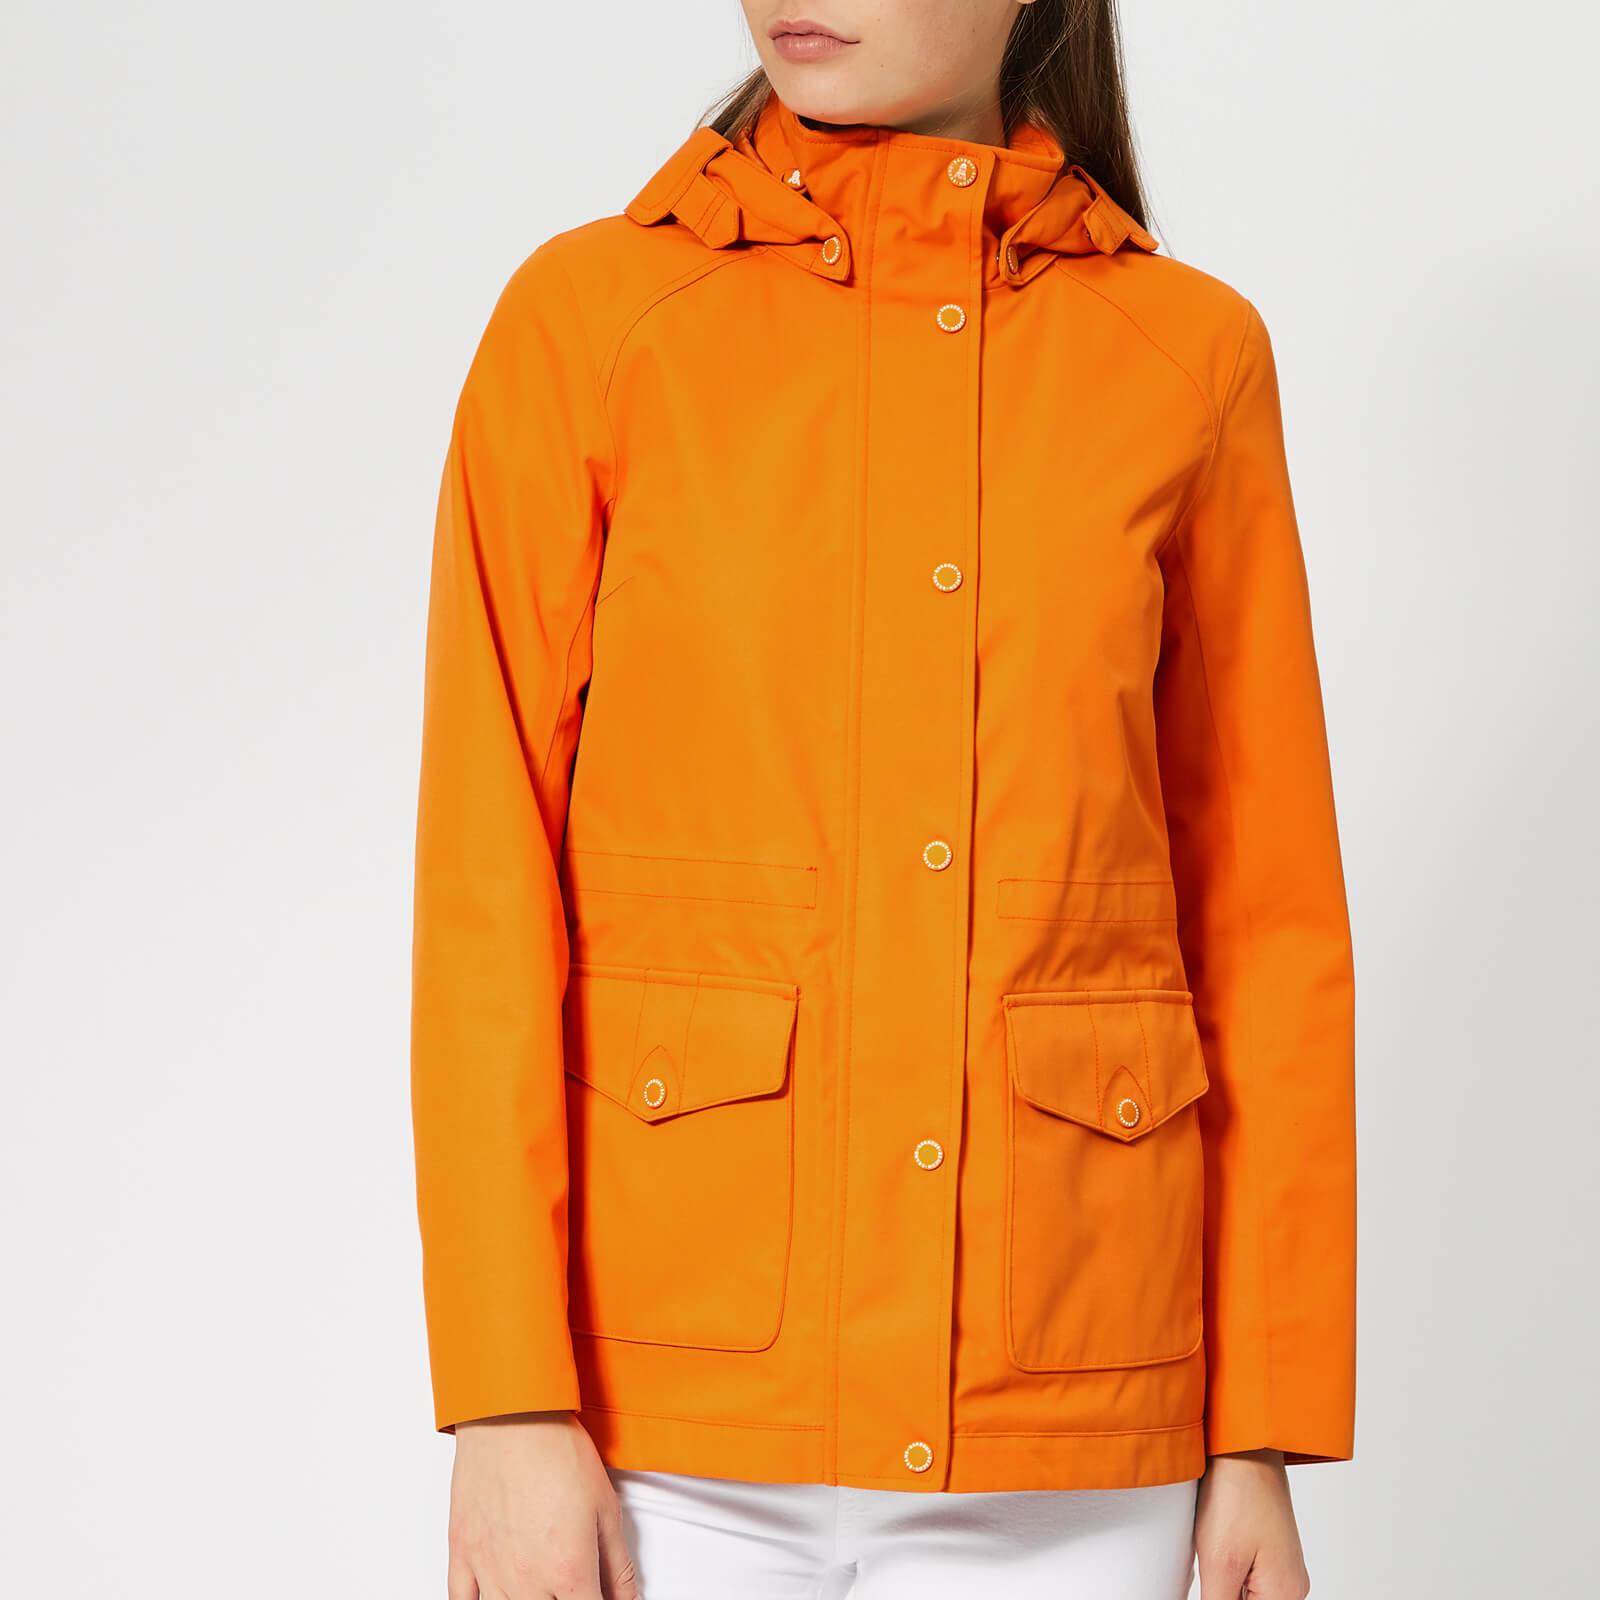 597bc1f4a Barbour Women's Backshore Jacket - Marigold Womens Clothing   TheHut.com